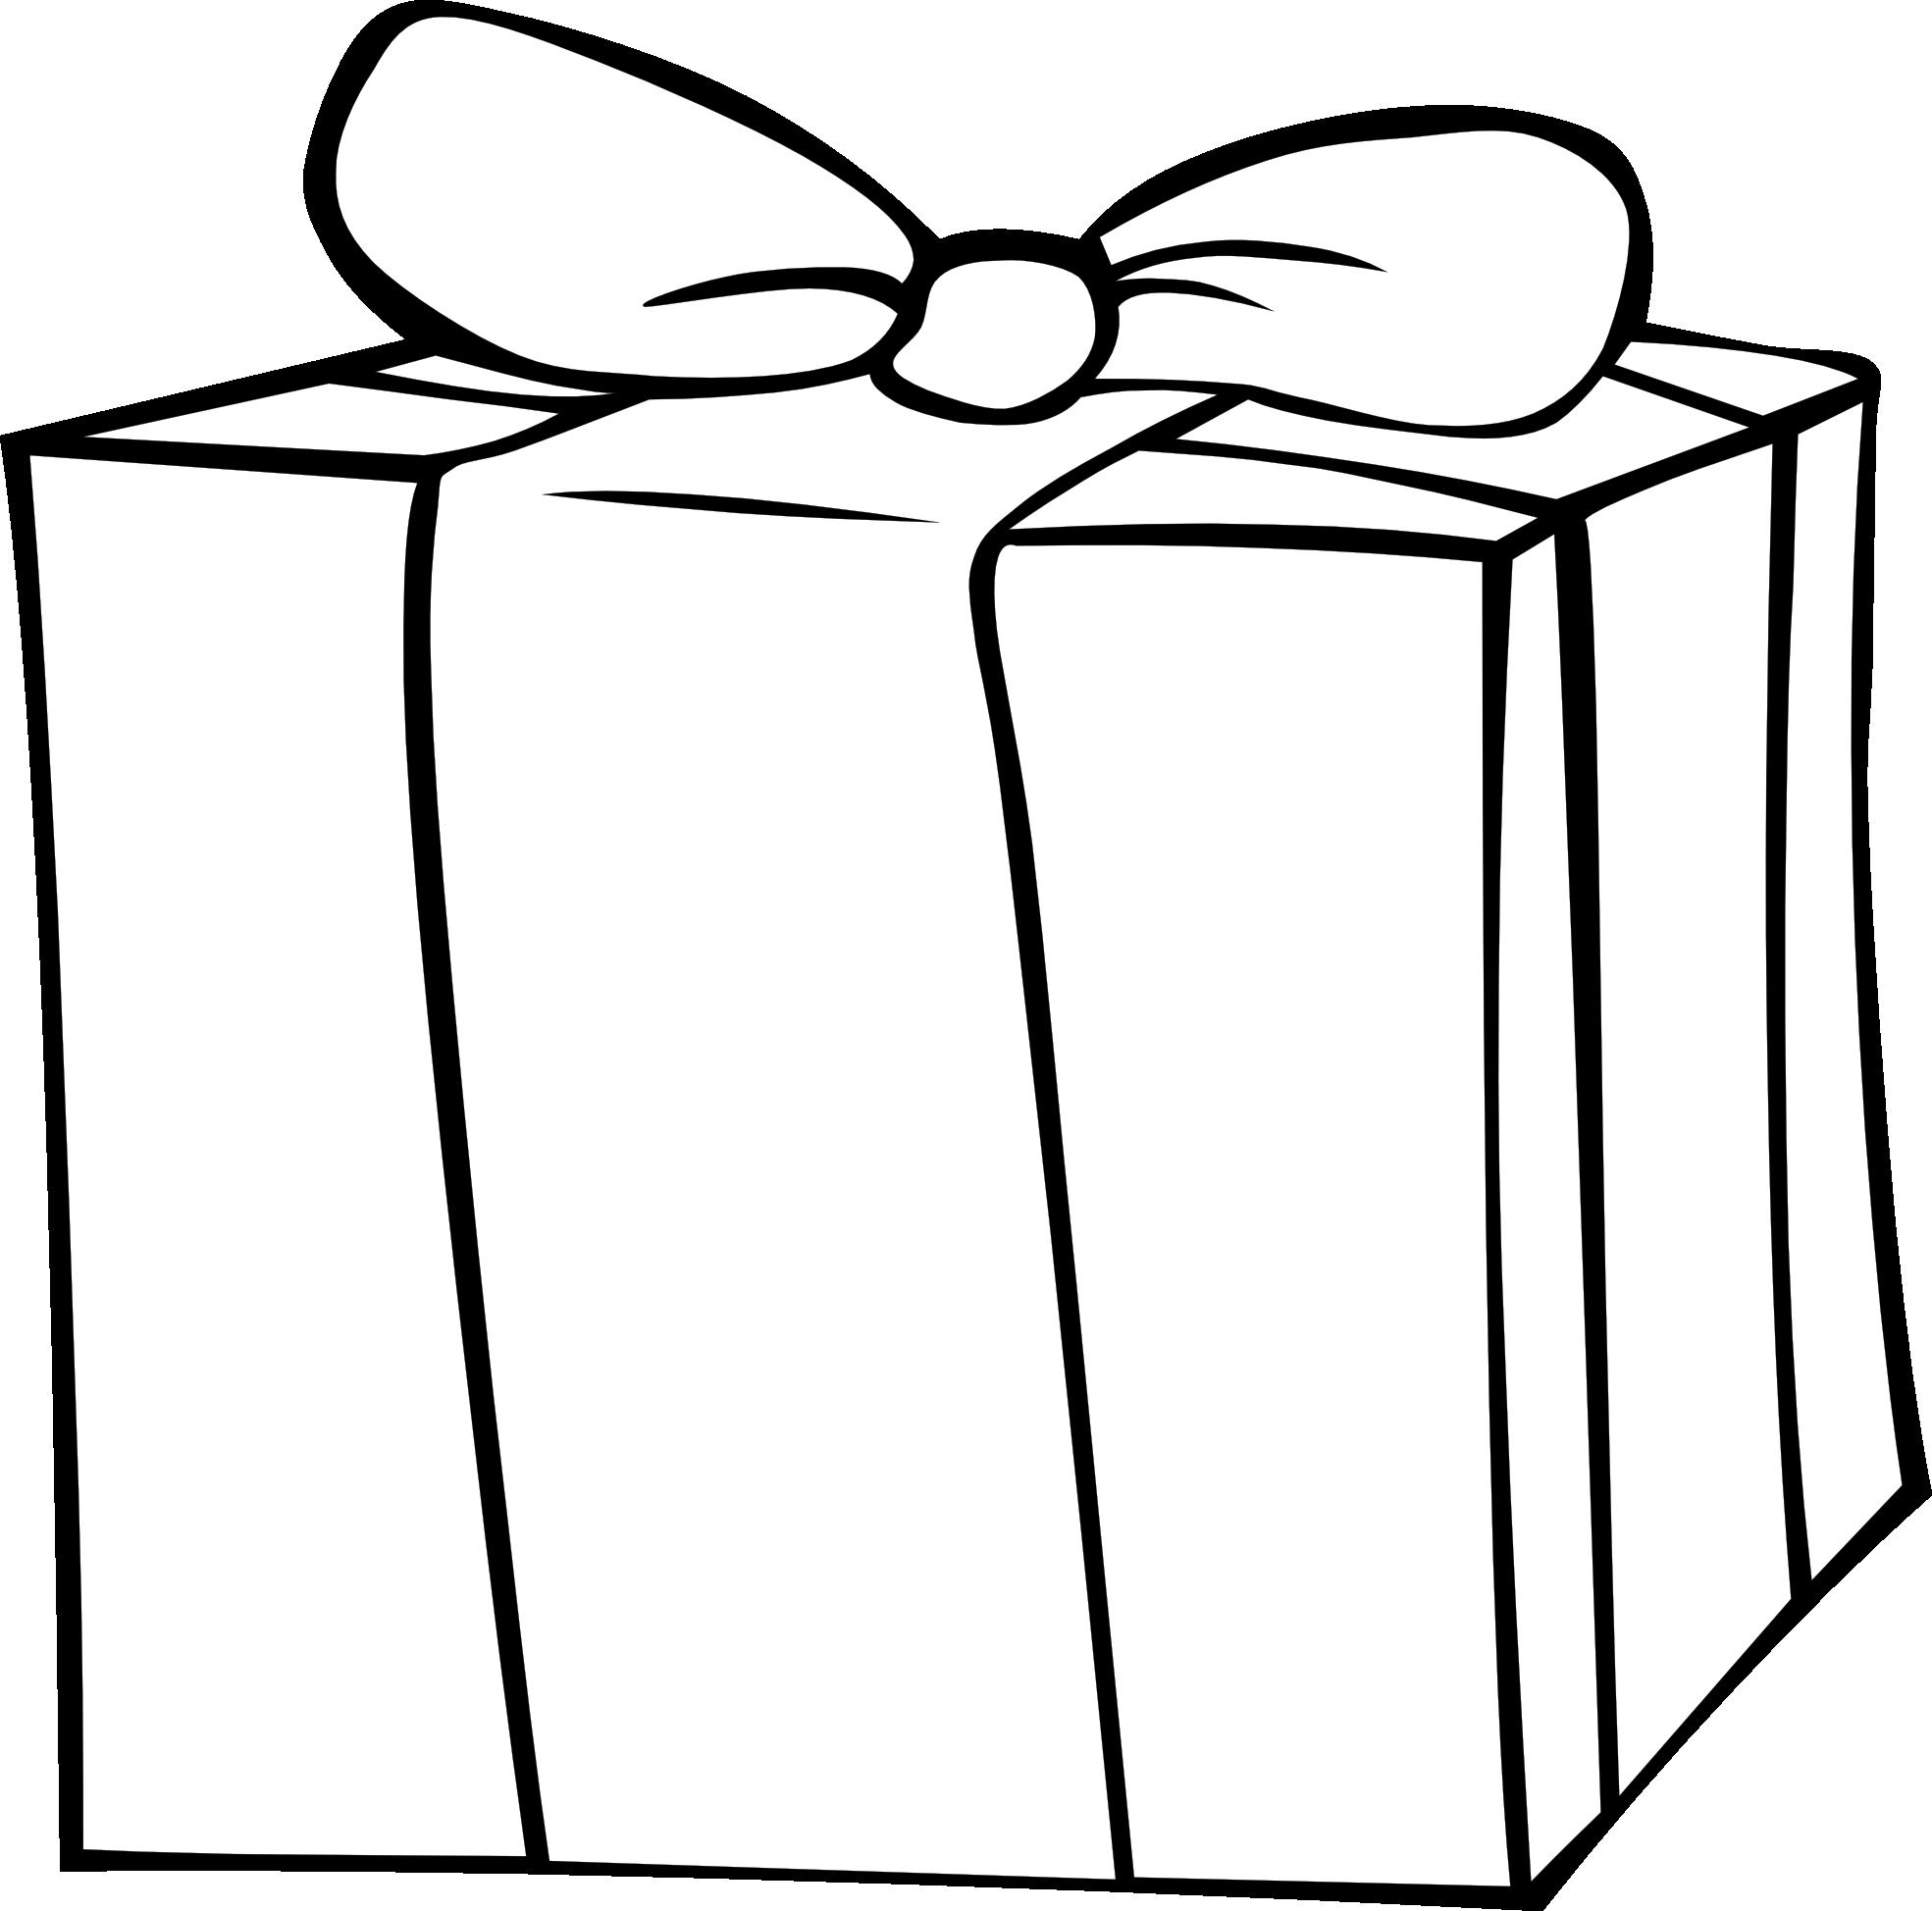 Gift Clipart Black And White Panda Free Images Rh Clipartpanda Com Birthday Present